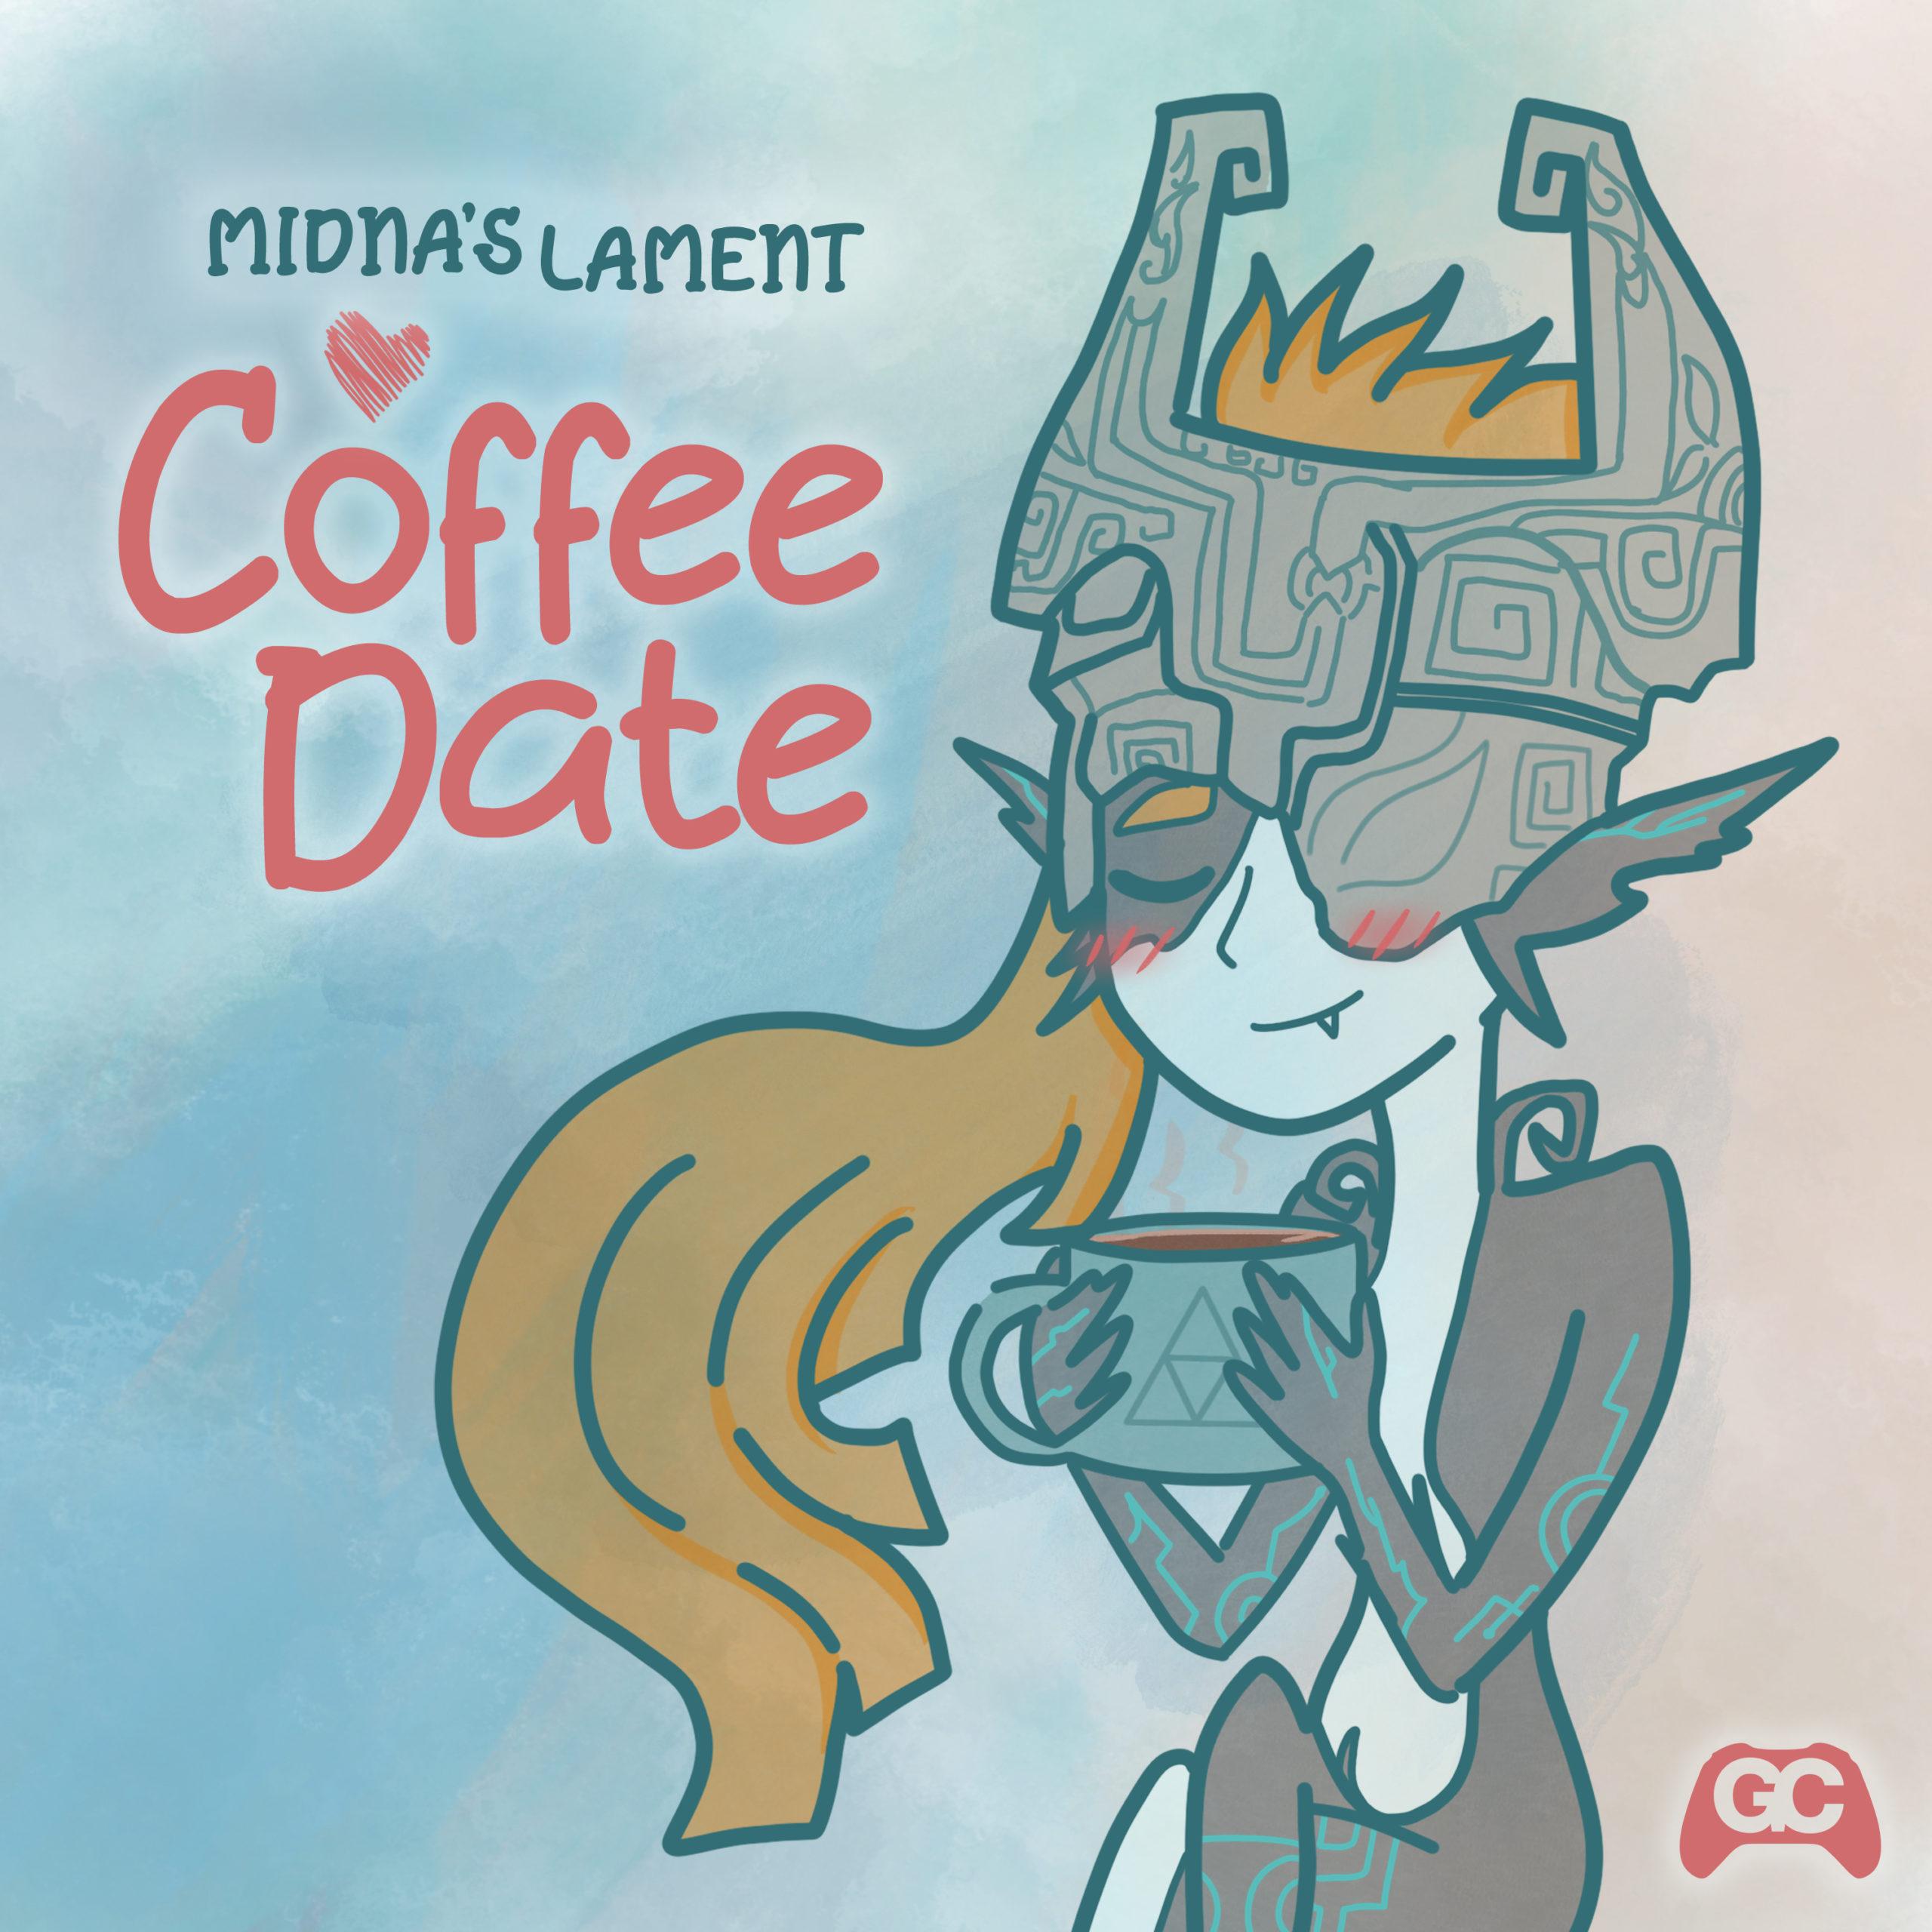 Coffee Date – Midna's Lament